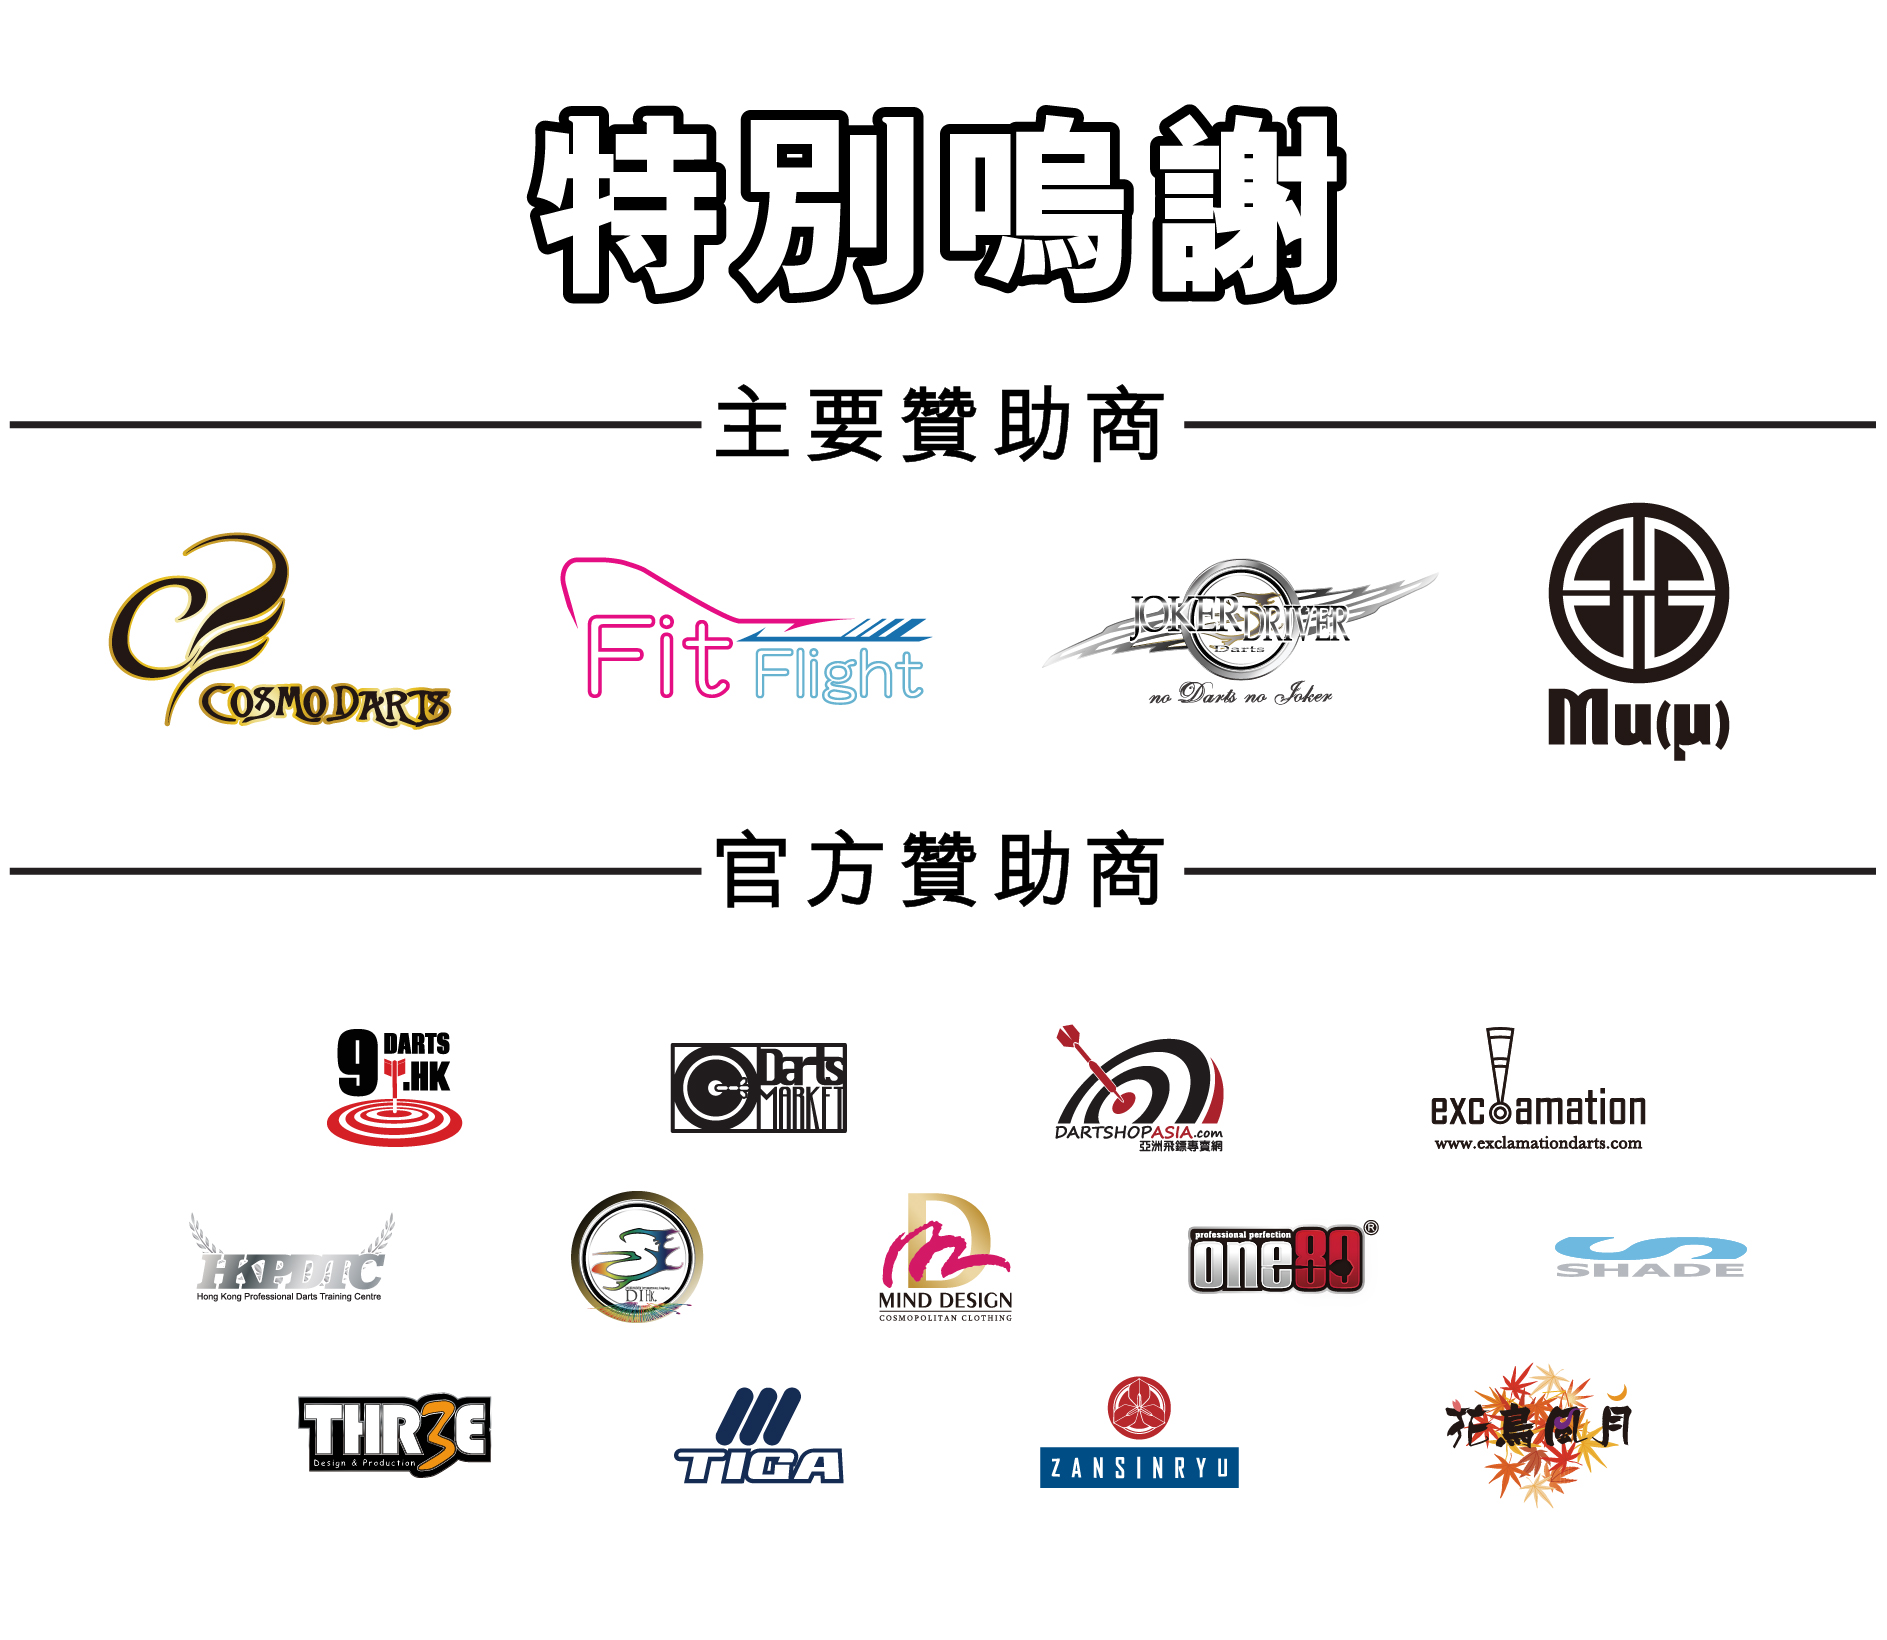 HONG KONG TOUR CHAMPIONSHIP 2017 SPONSORS